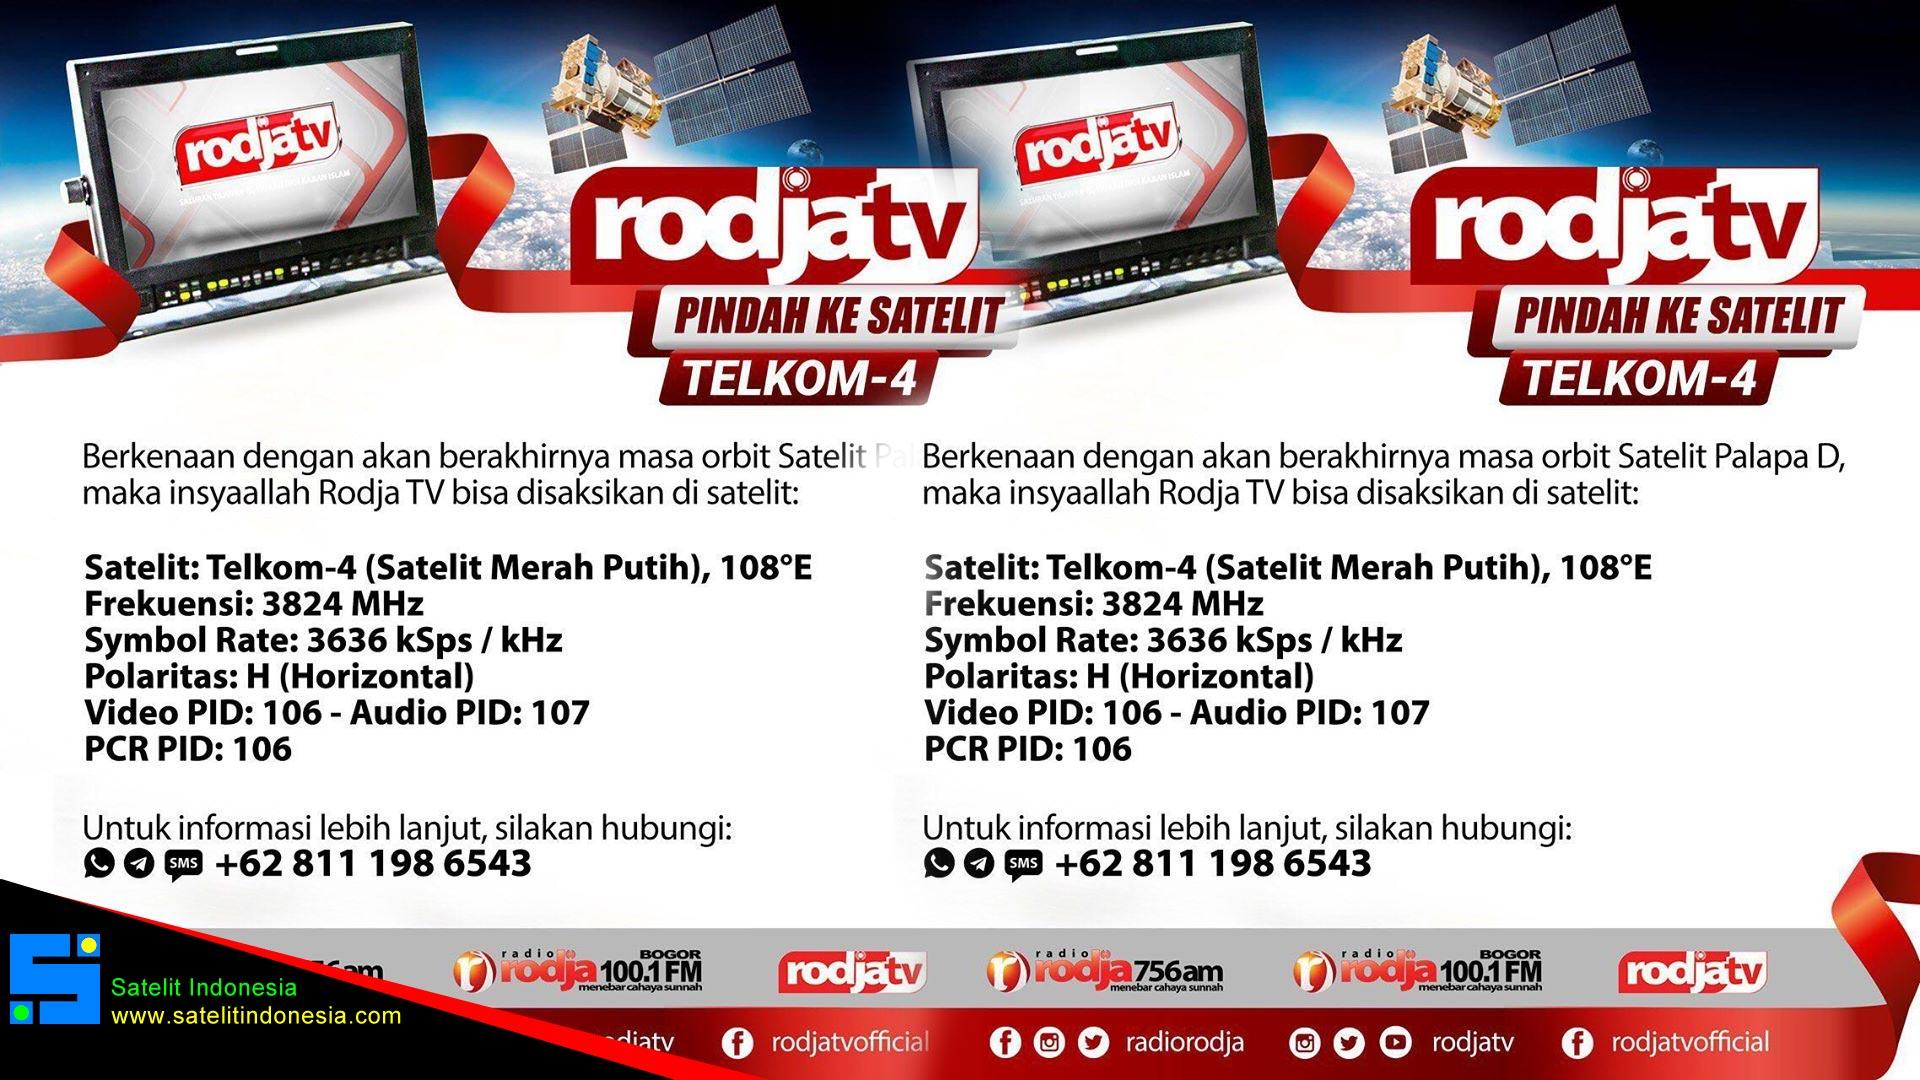 Rodja Tv Pindah Satelit Telkom 4 dari Palapa D